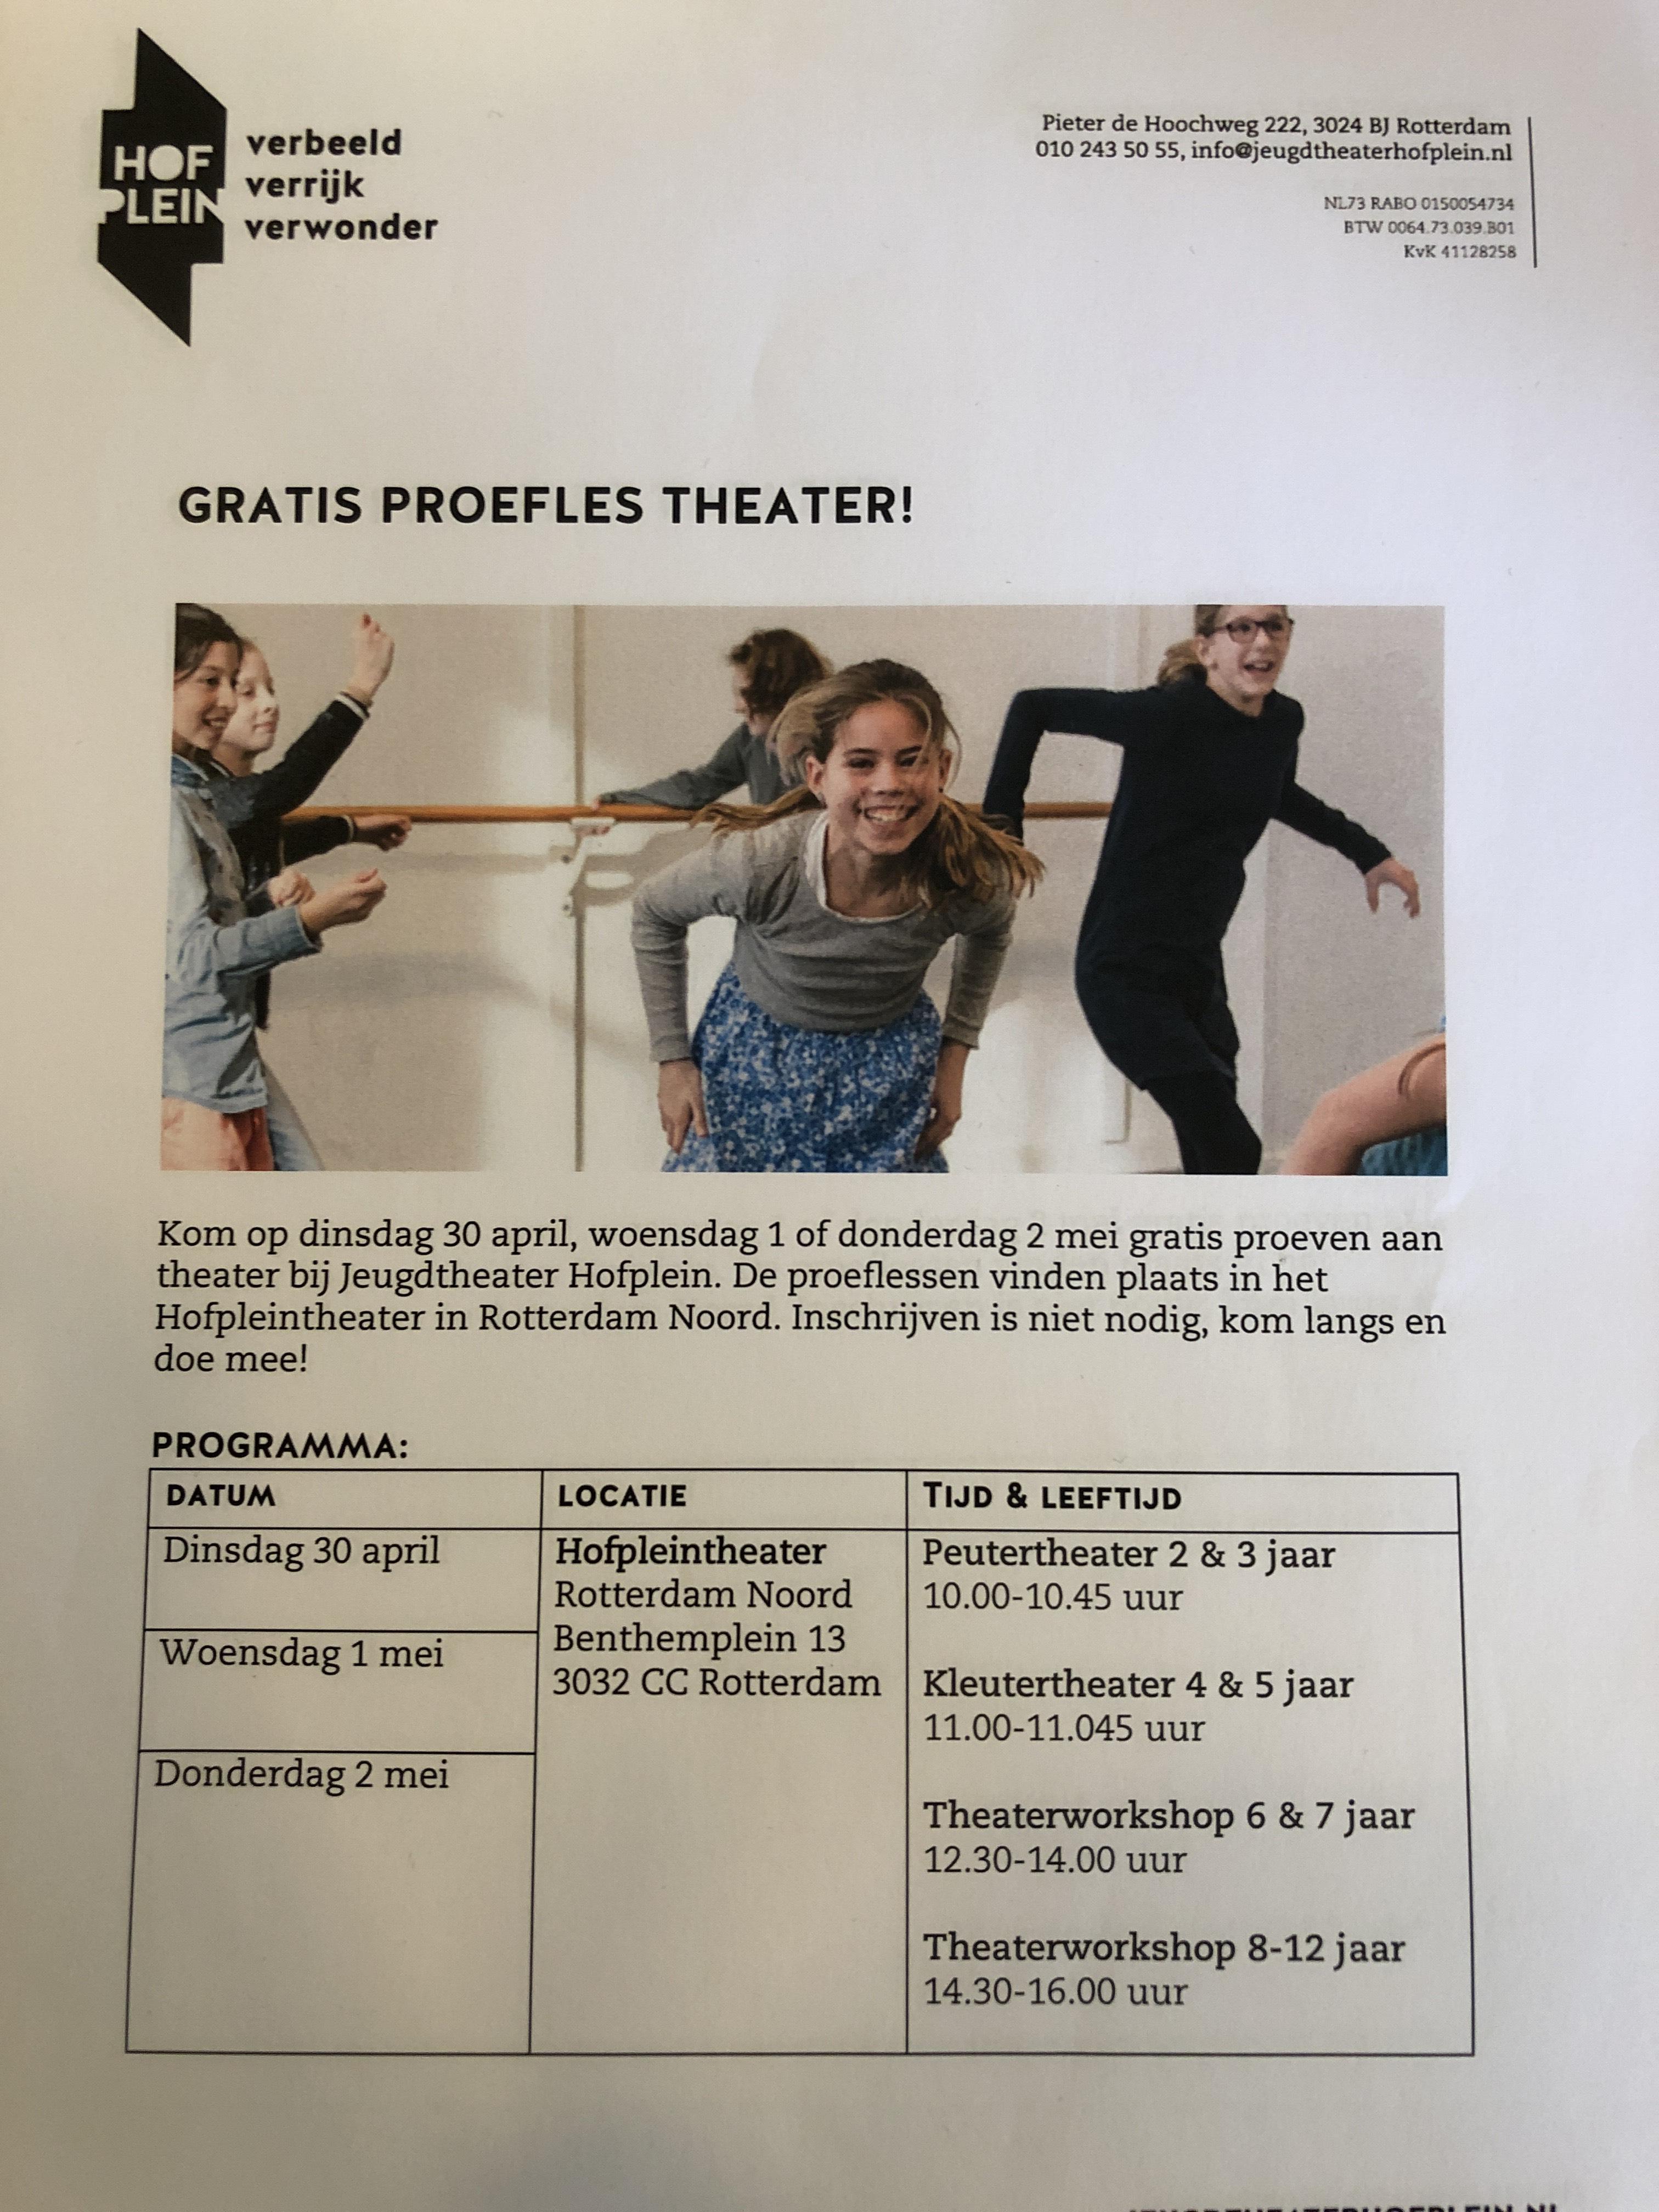 Lokaal - gratis proefles theater @ hofplein theater rotterdam